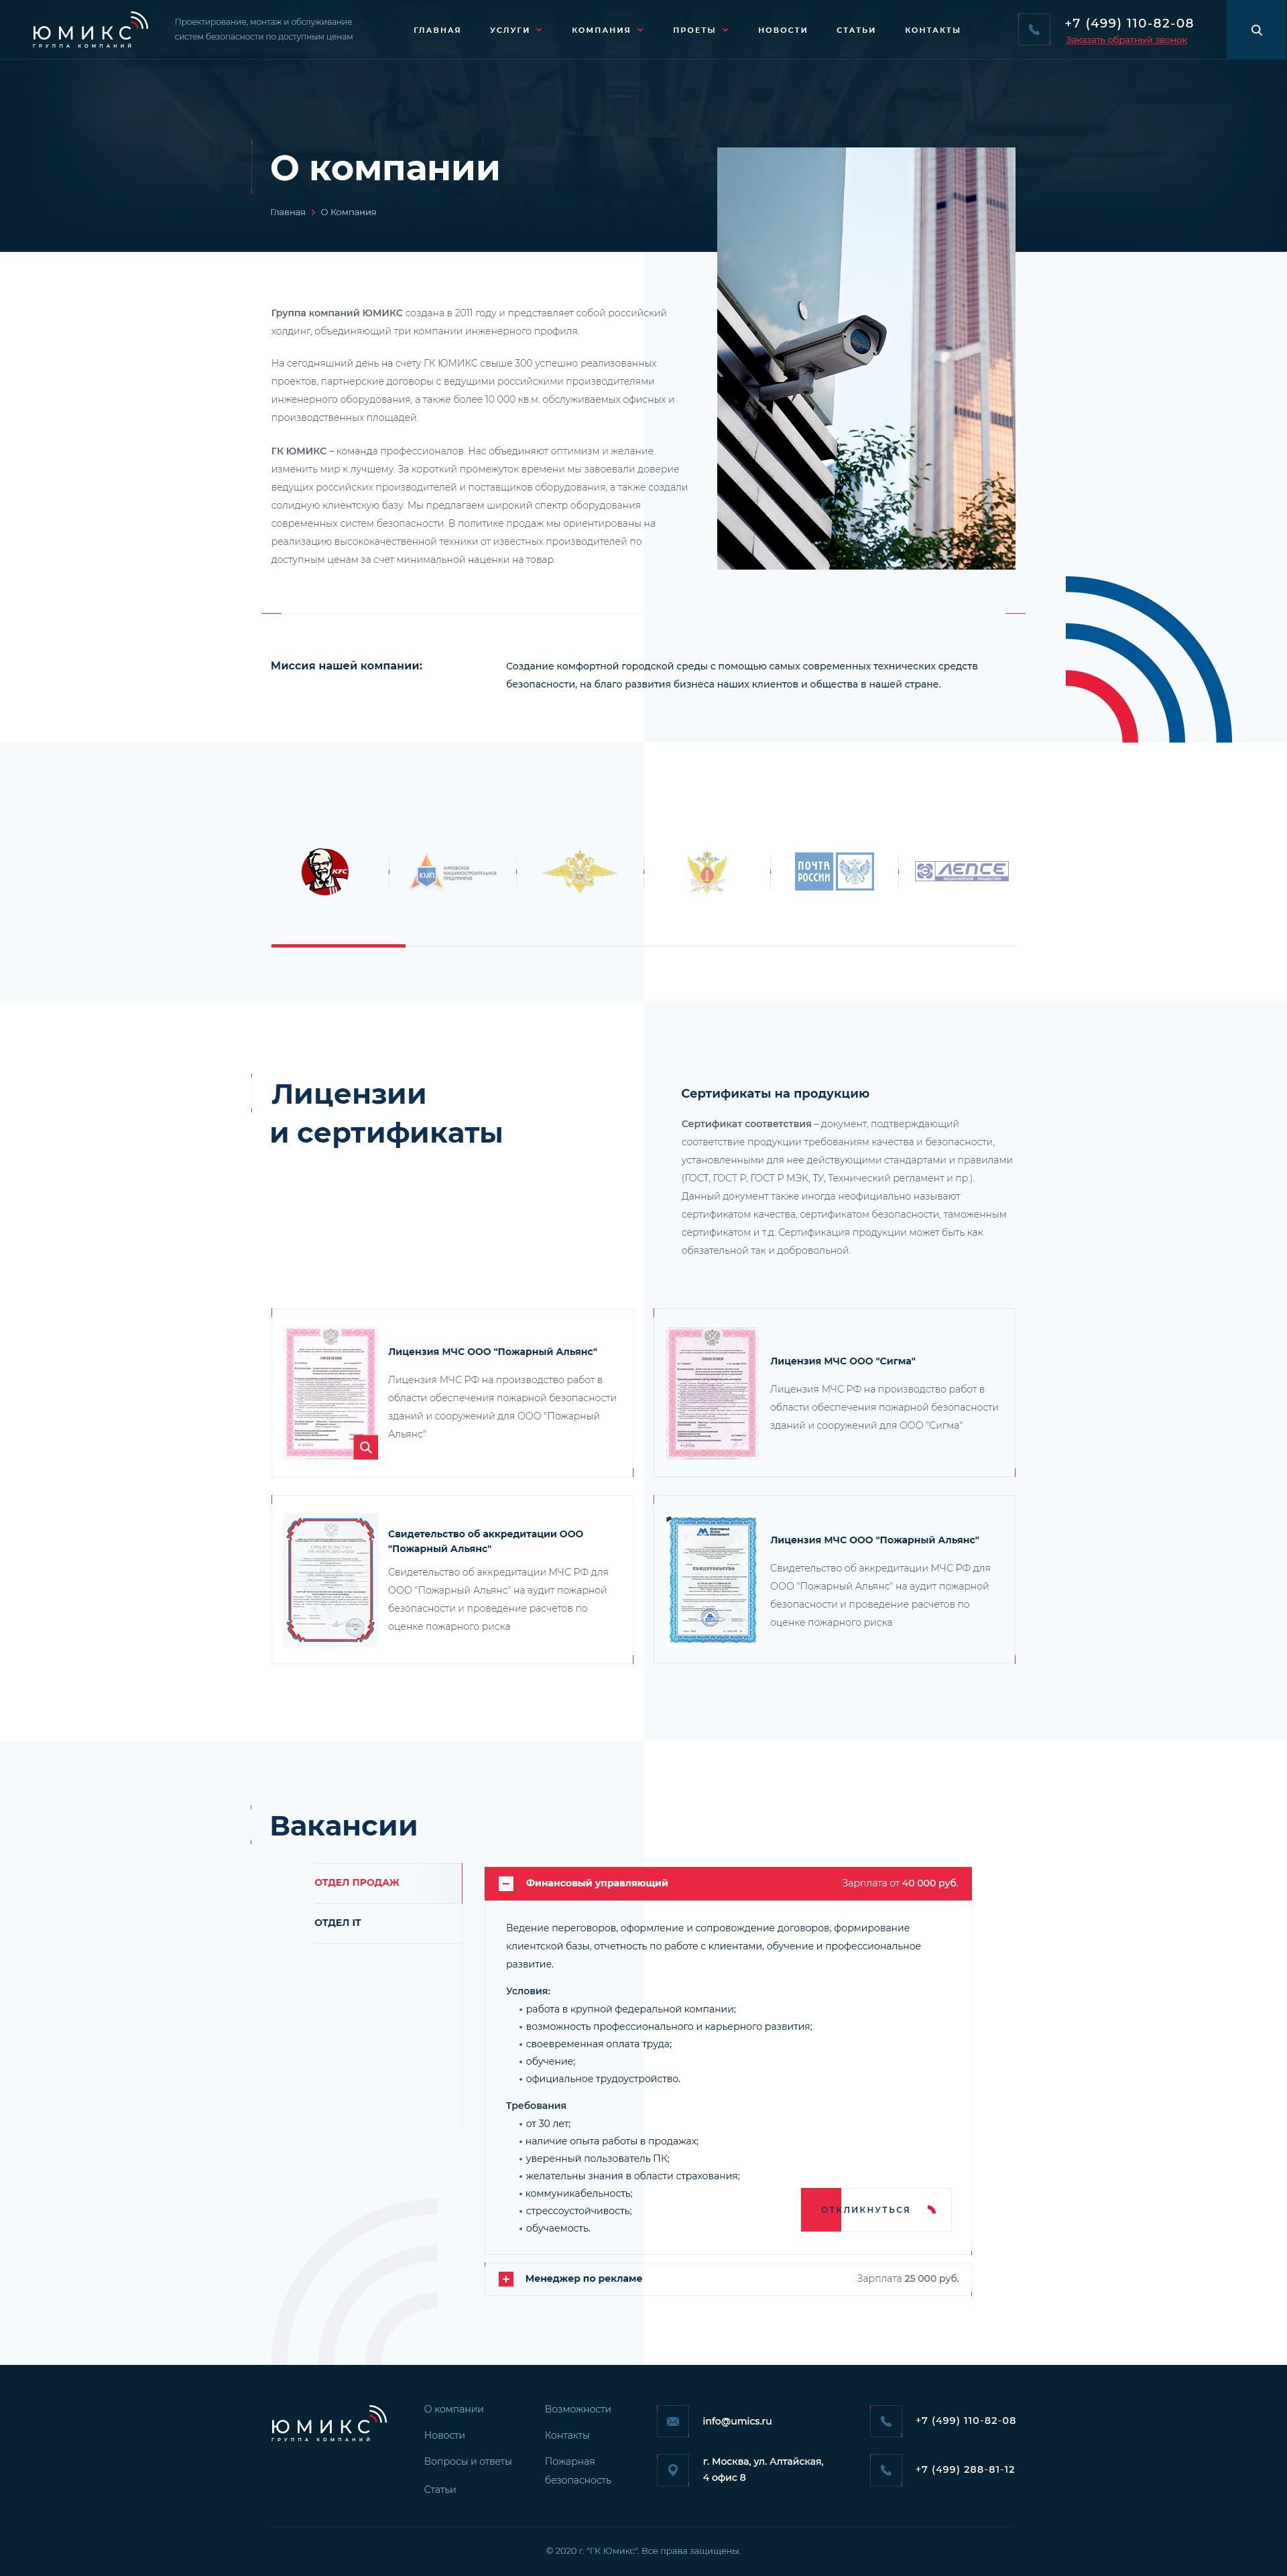 Umics_03_About_Company_page_1.0